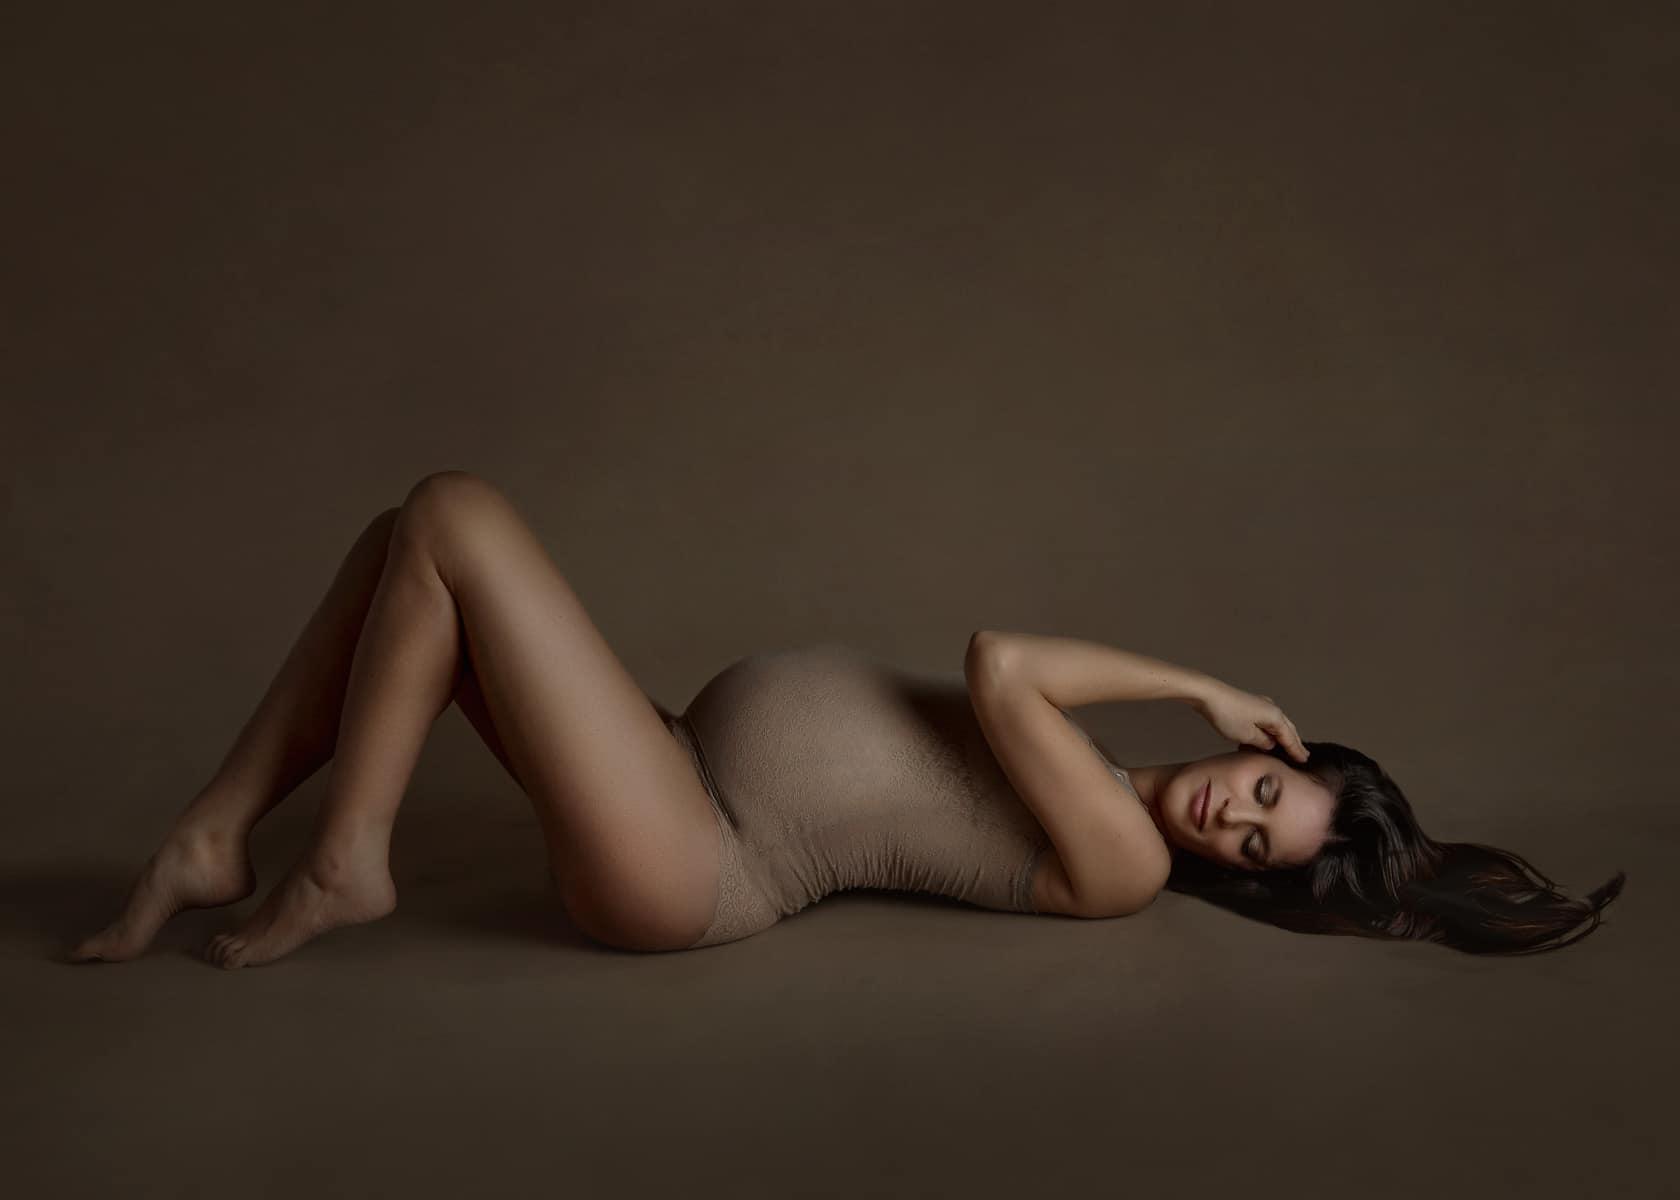 KRISTINA RECHE Petit Monde WORKSHOP FOTOGRAFIA MATERNITY EMBARAZO 9007 - Maternity